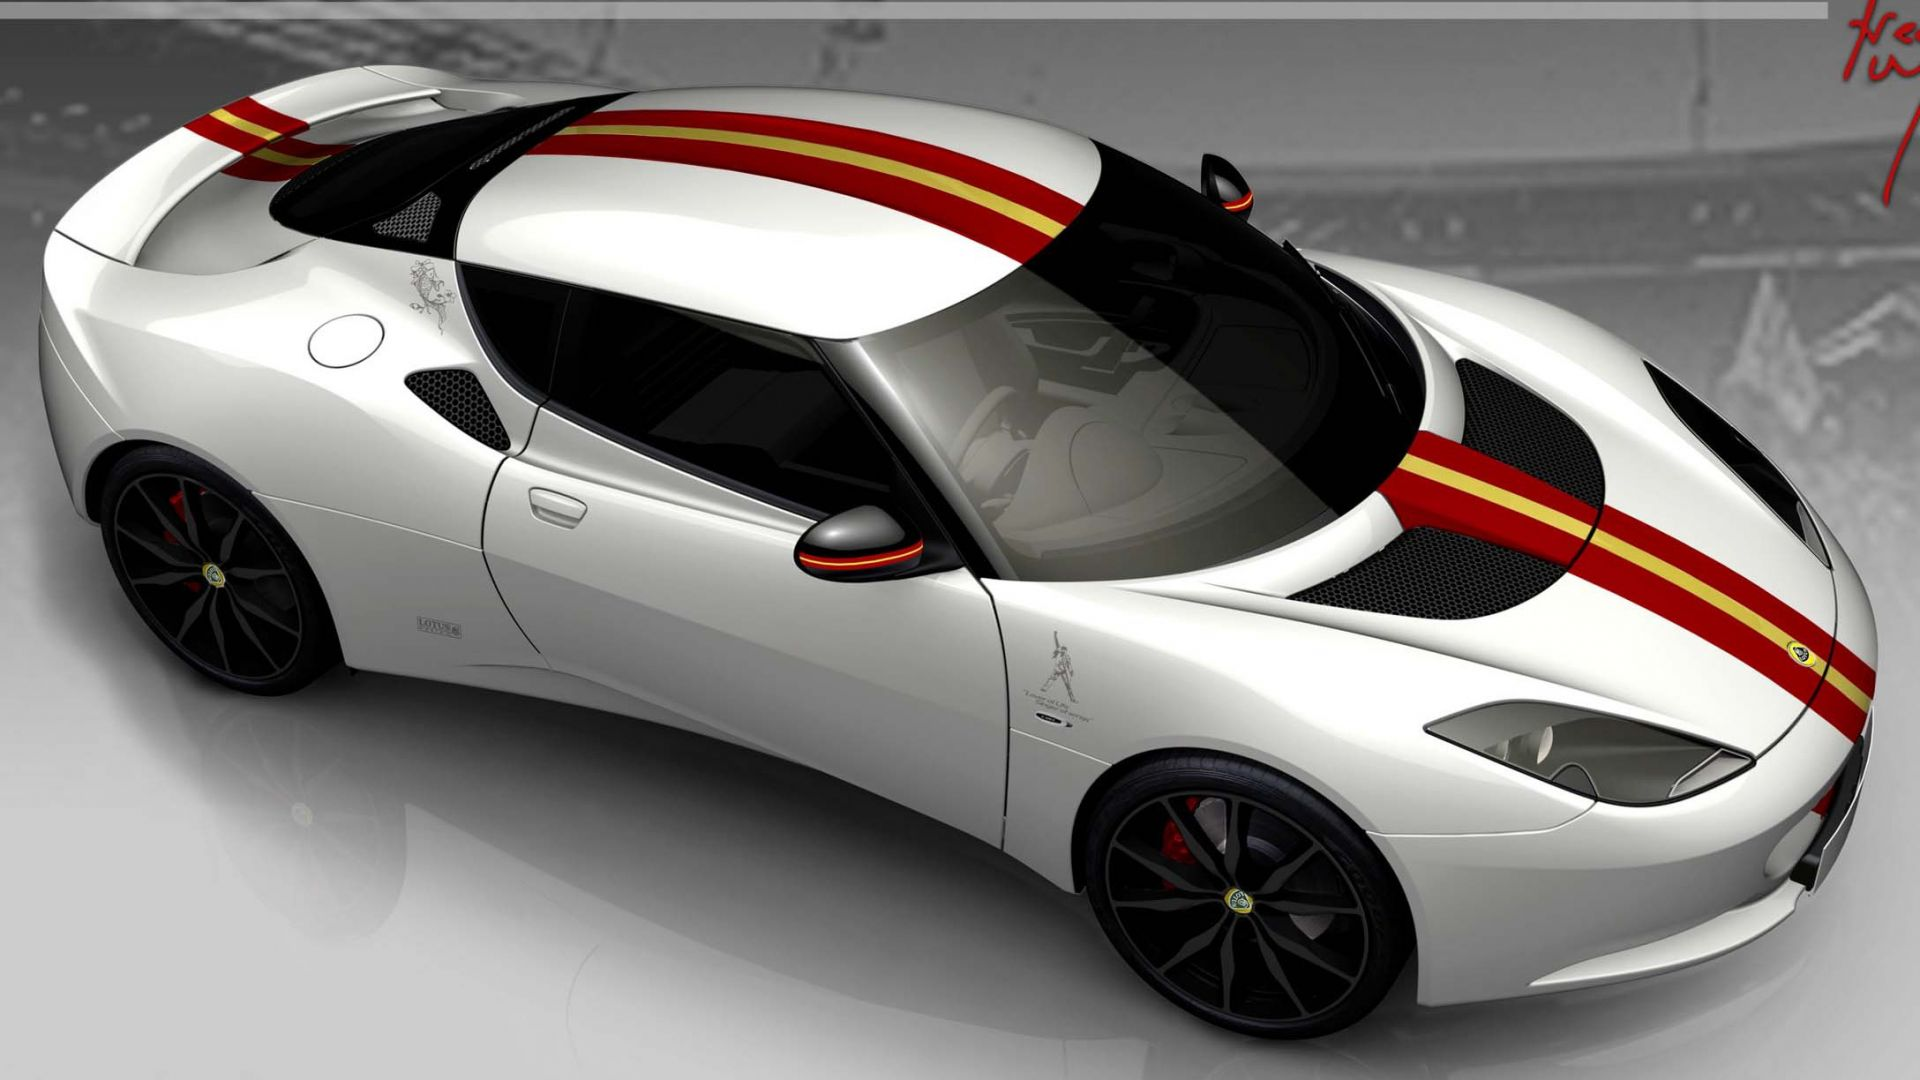 Immagine 0: Lotus Evora S Freddie Mercury Edition